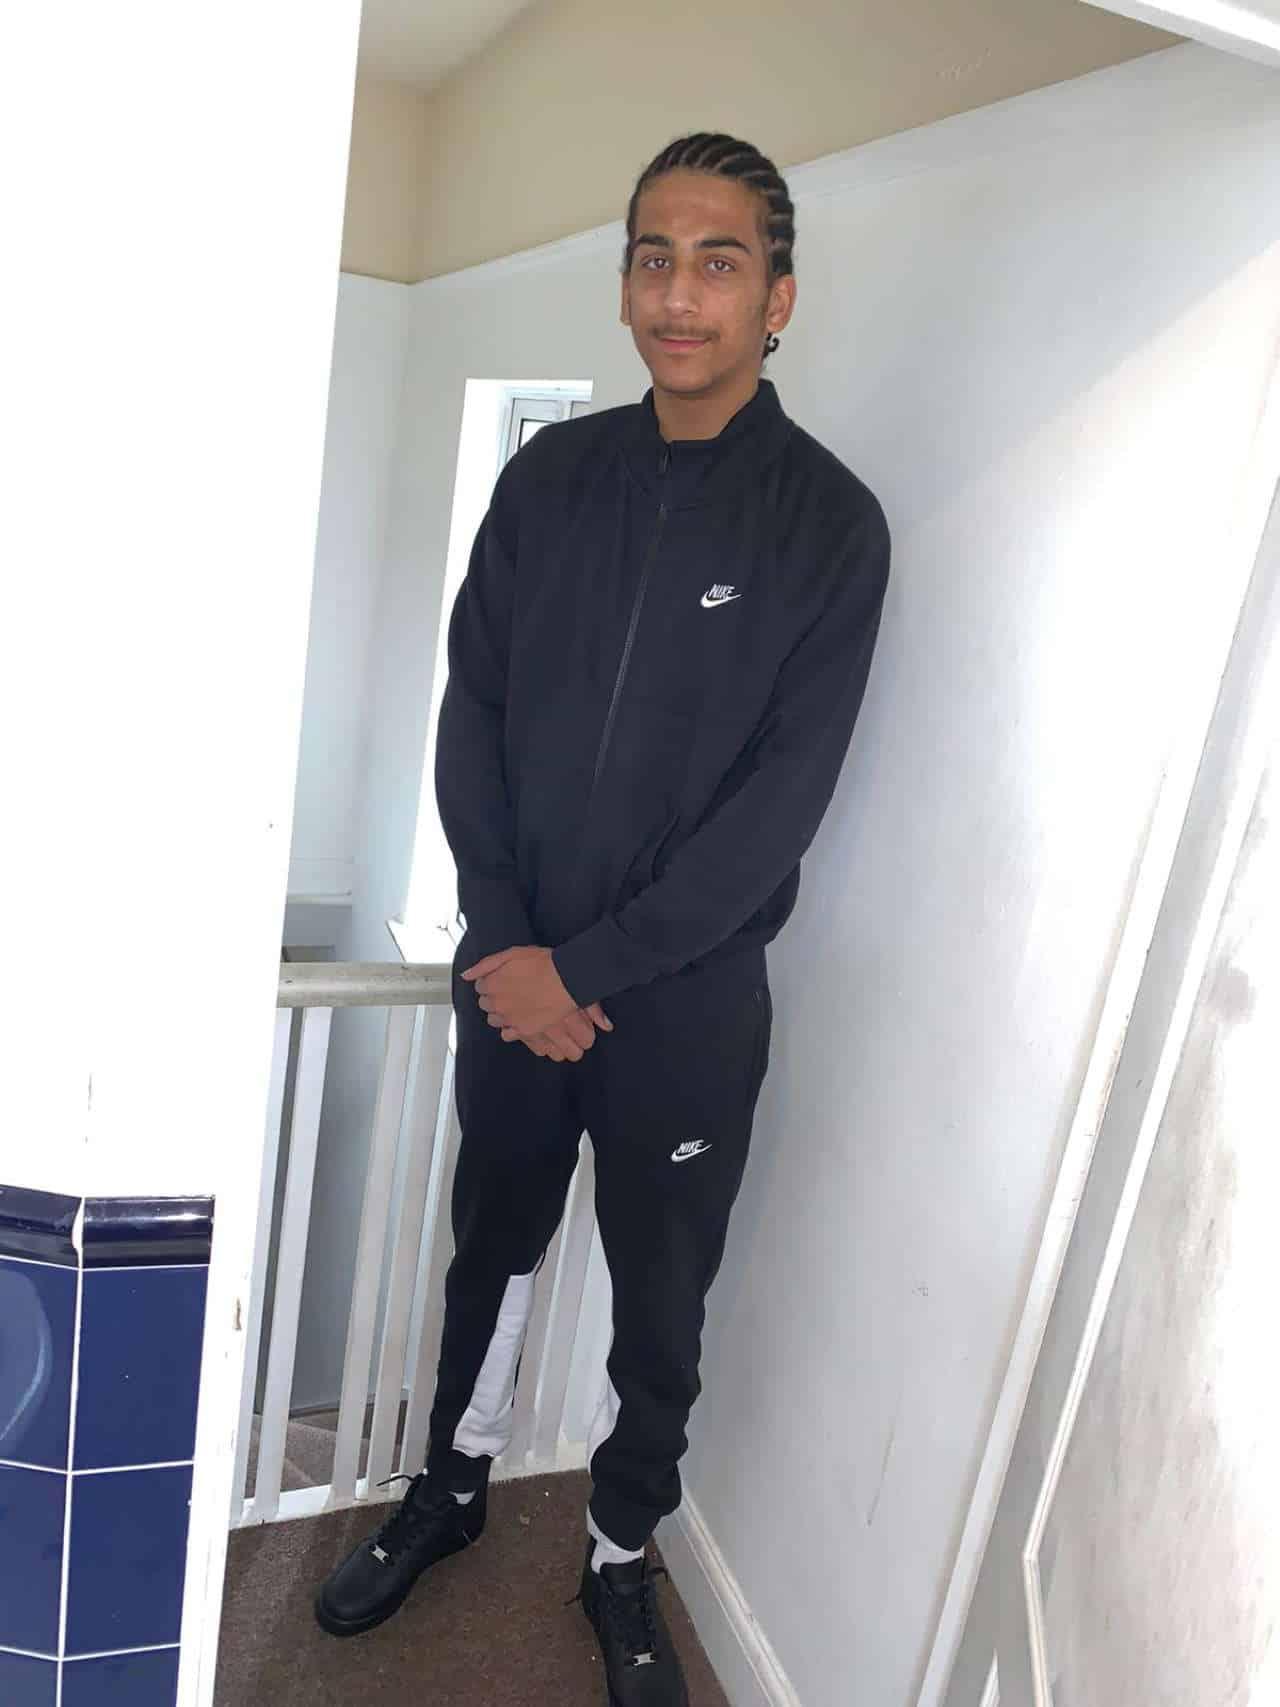 East Croydon stabbing victim named